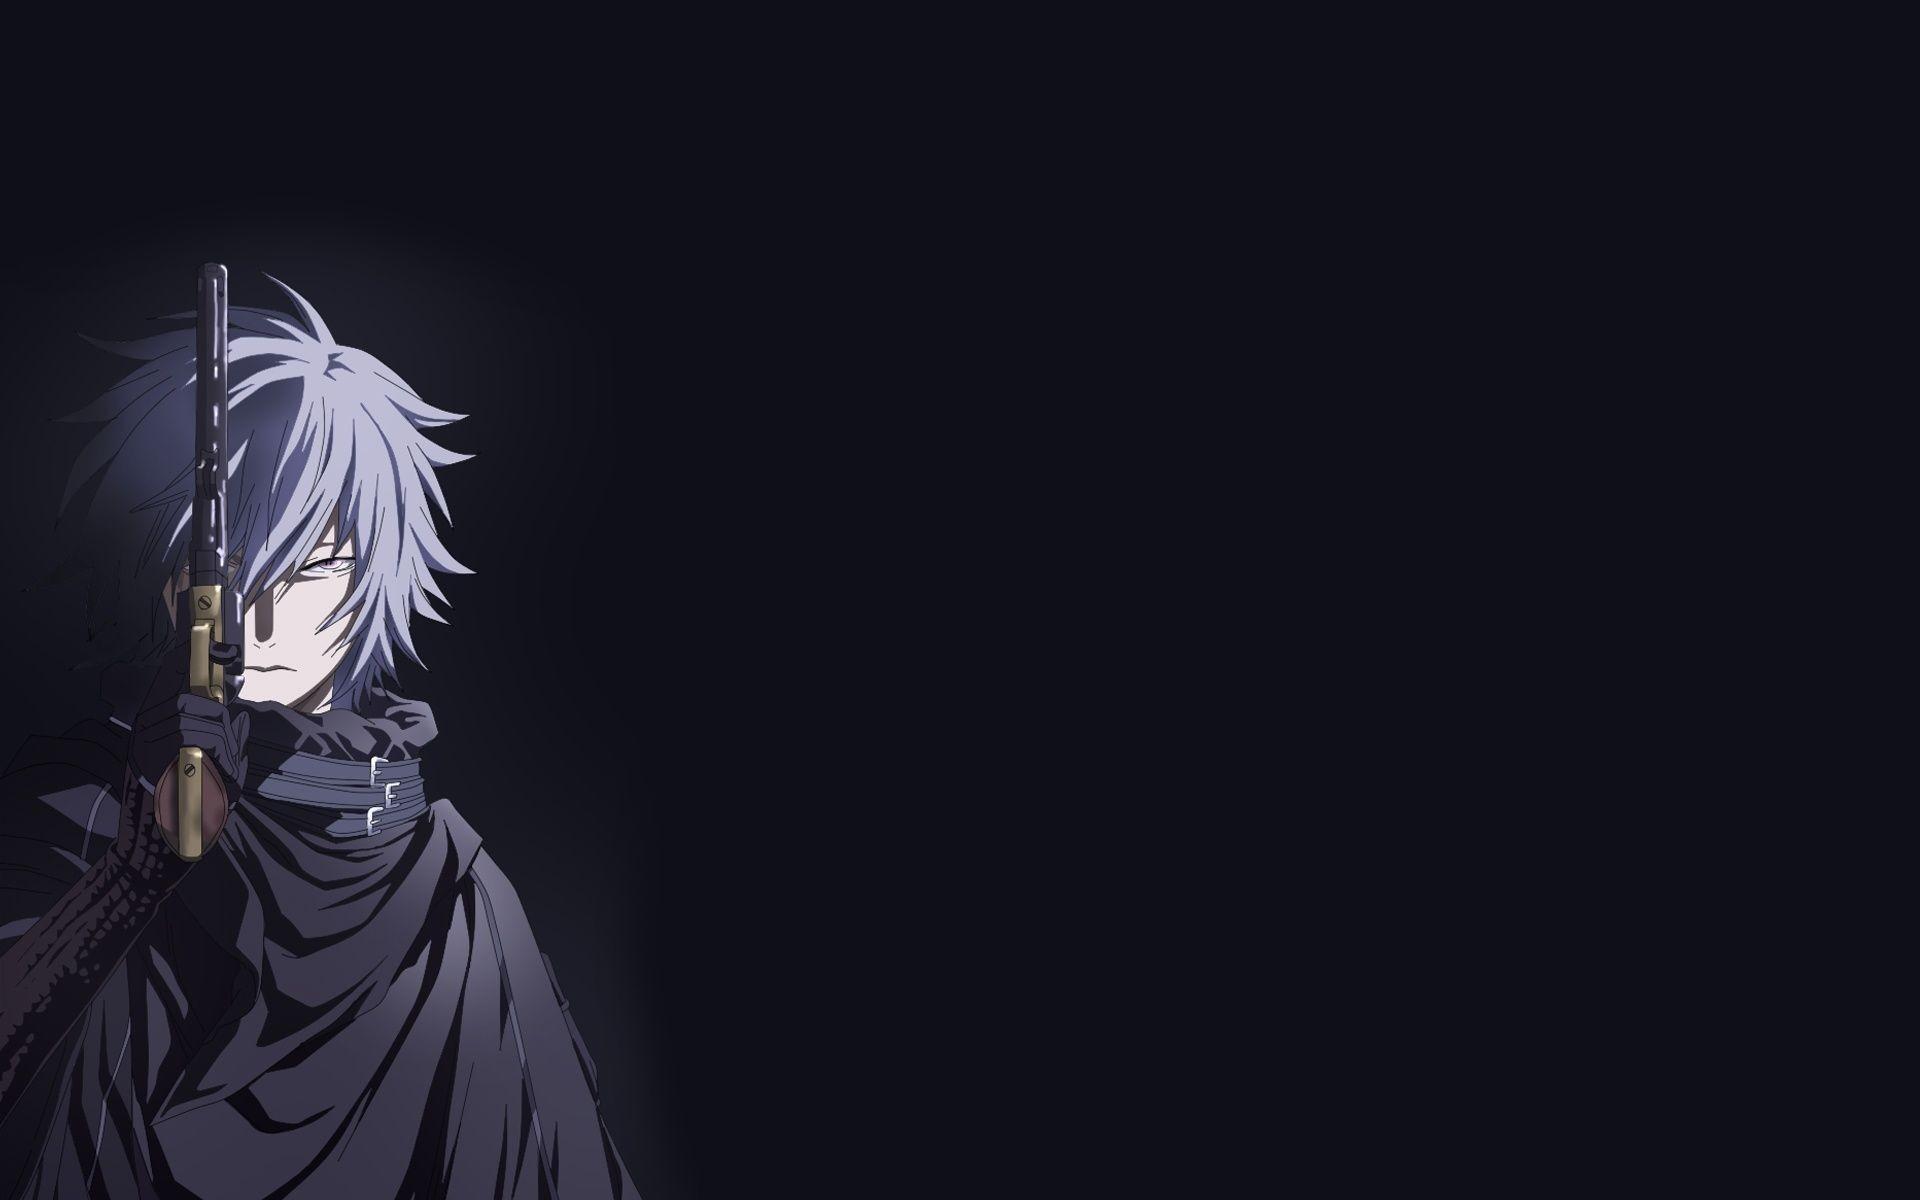 Dark Anime Background Scenery ·① Download Free Stunning